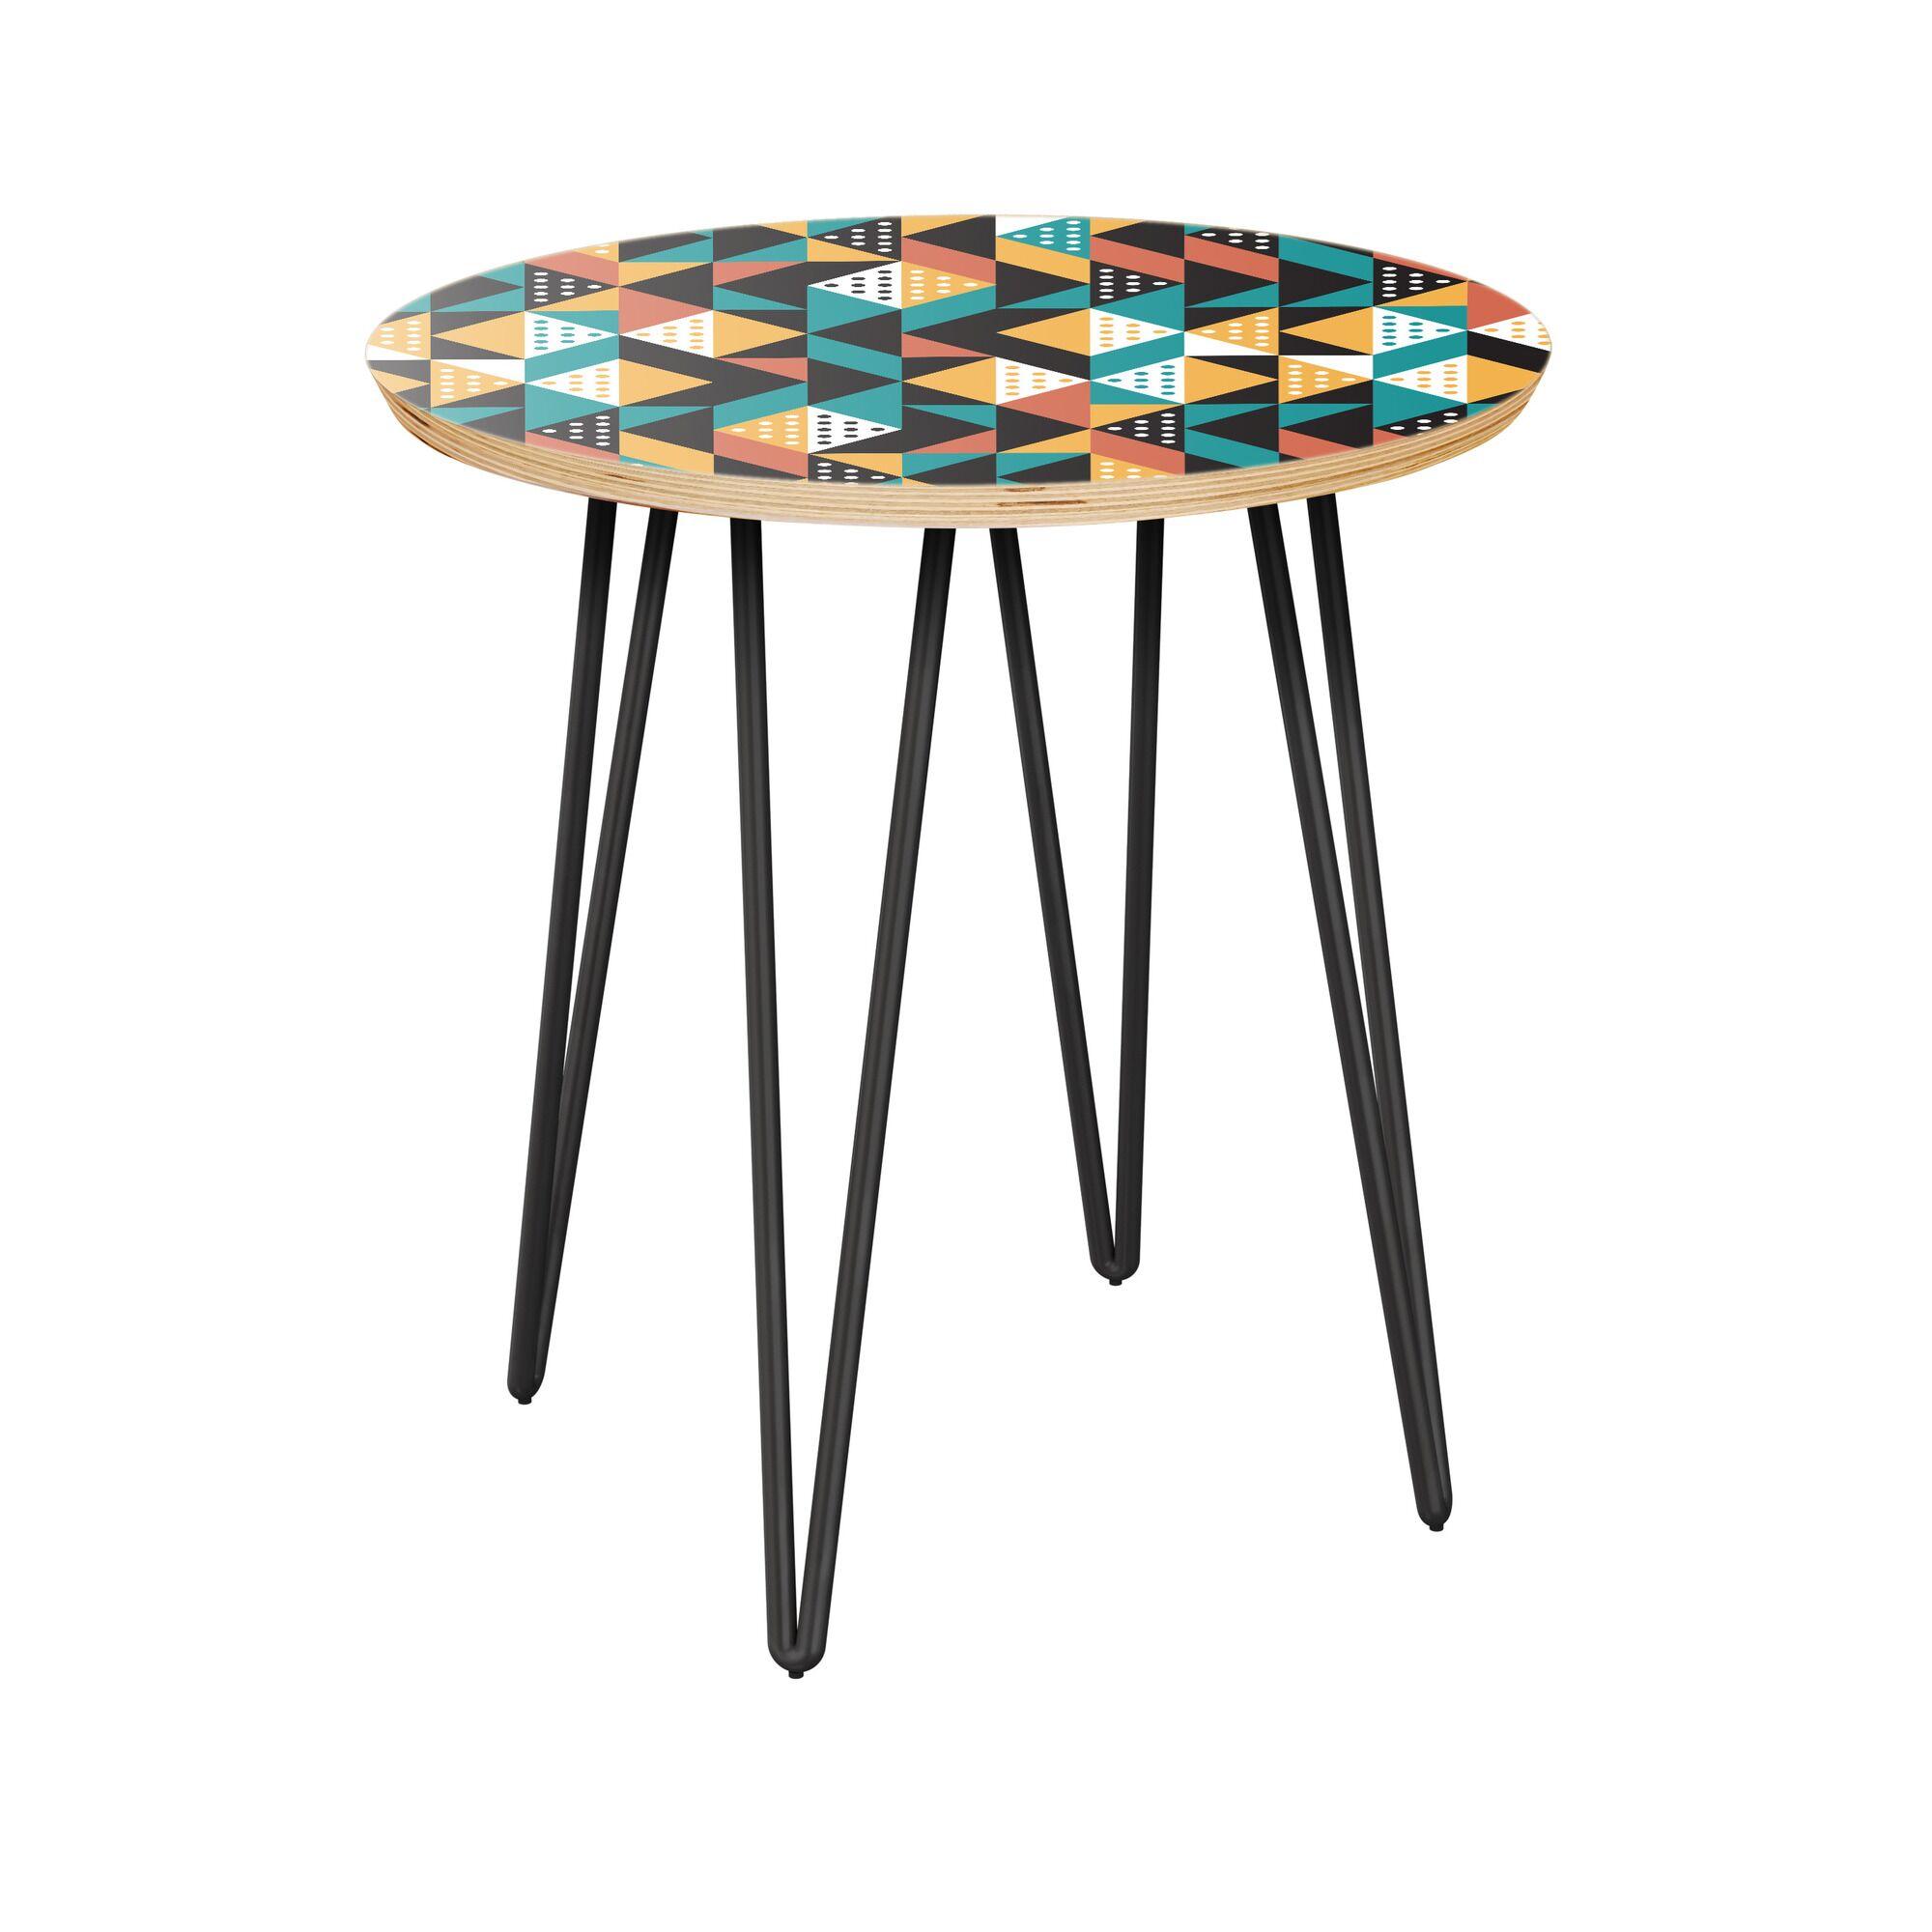 Aprea End Table Table Top Color: Natural, Table Base Color: Black